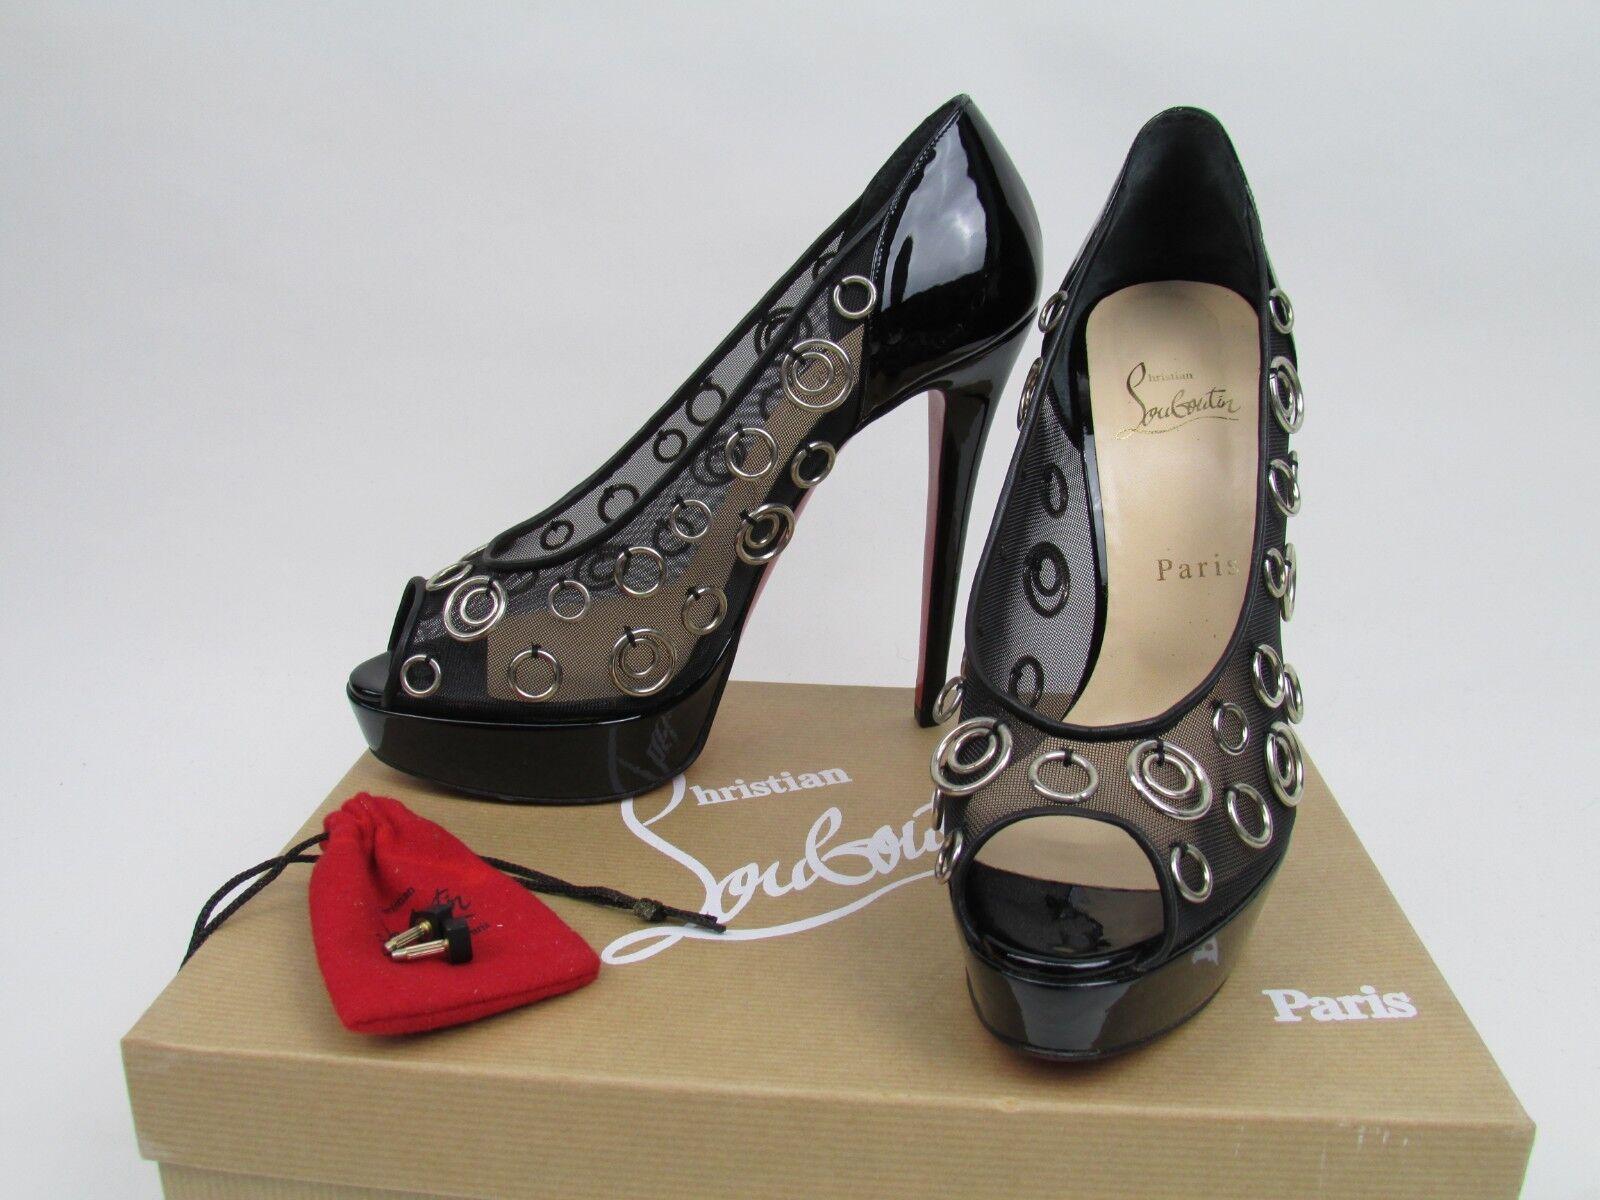 Christian Louboutin Pierce 140 Patent Calf Heels 38.5 UK 5.5